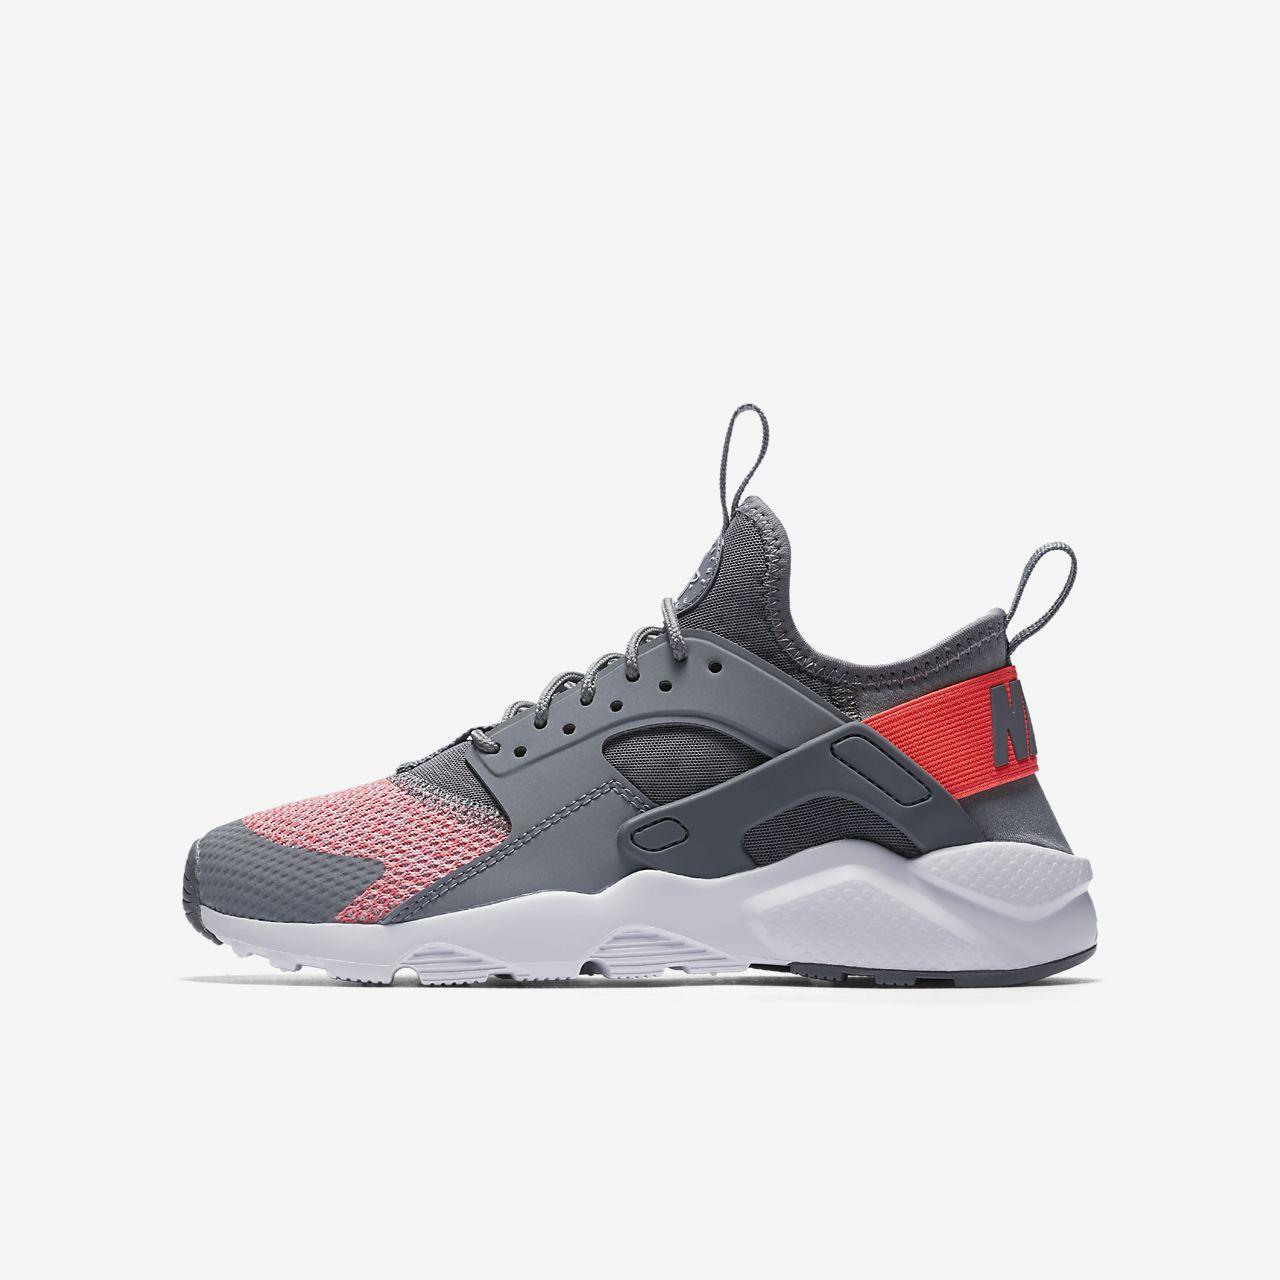 ... Nike Air Huarache Run Ultra SE Older Kids' Shoe